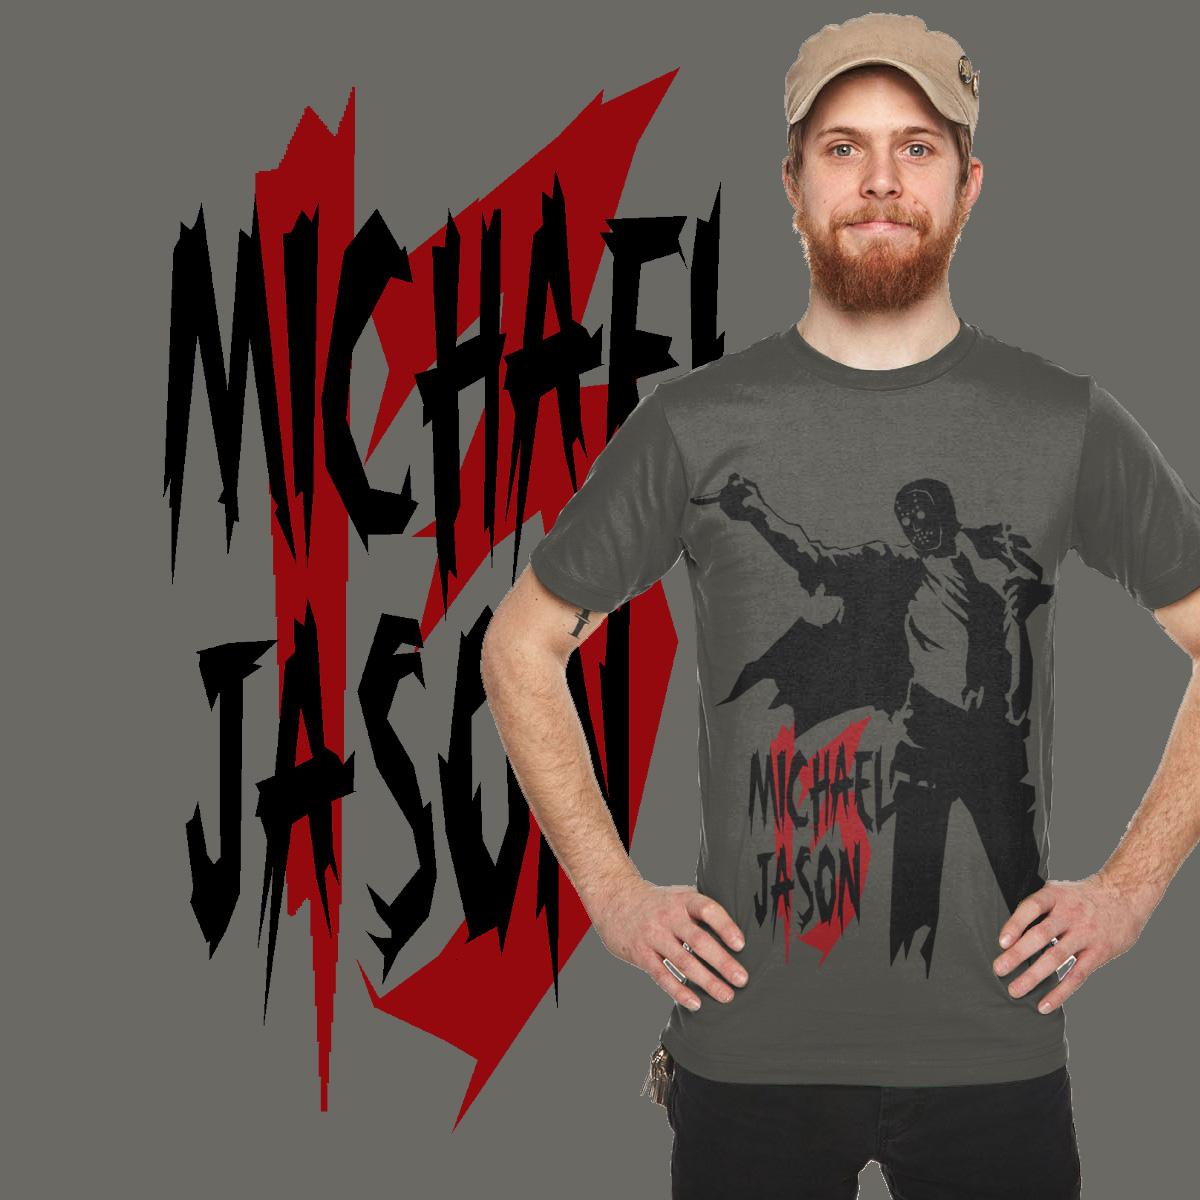 Michael Jason  by graditio on Threadless